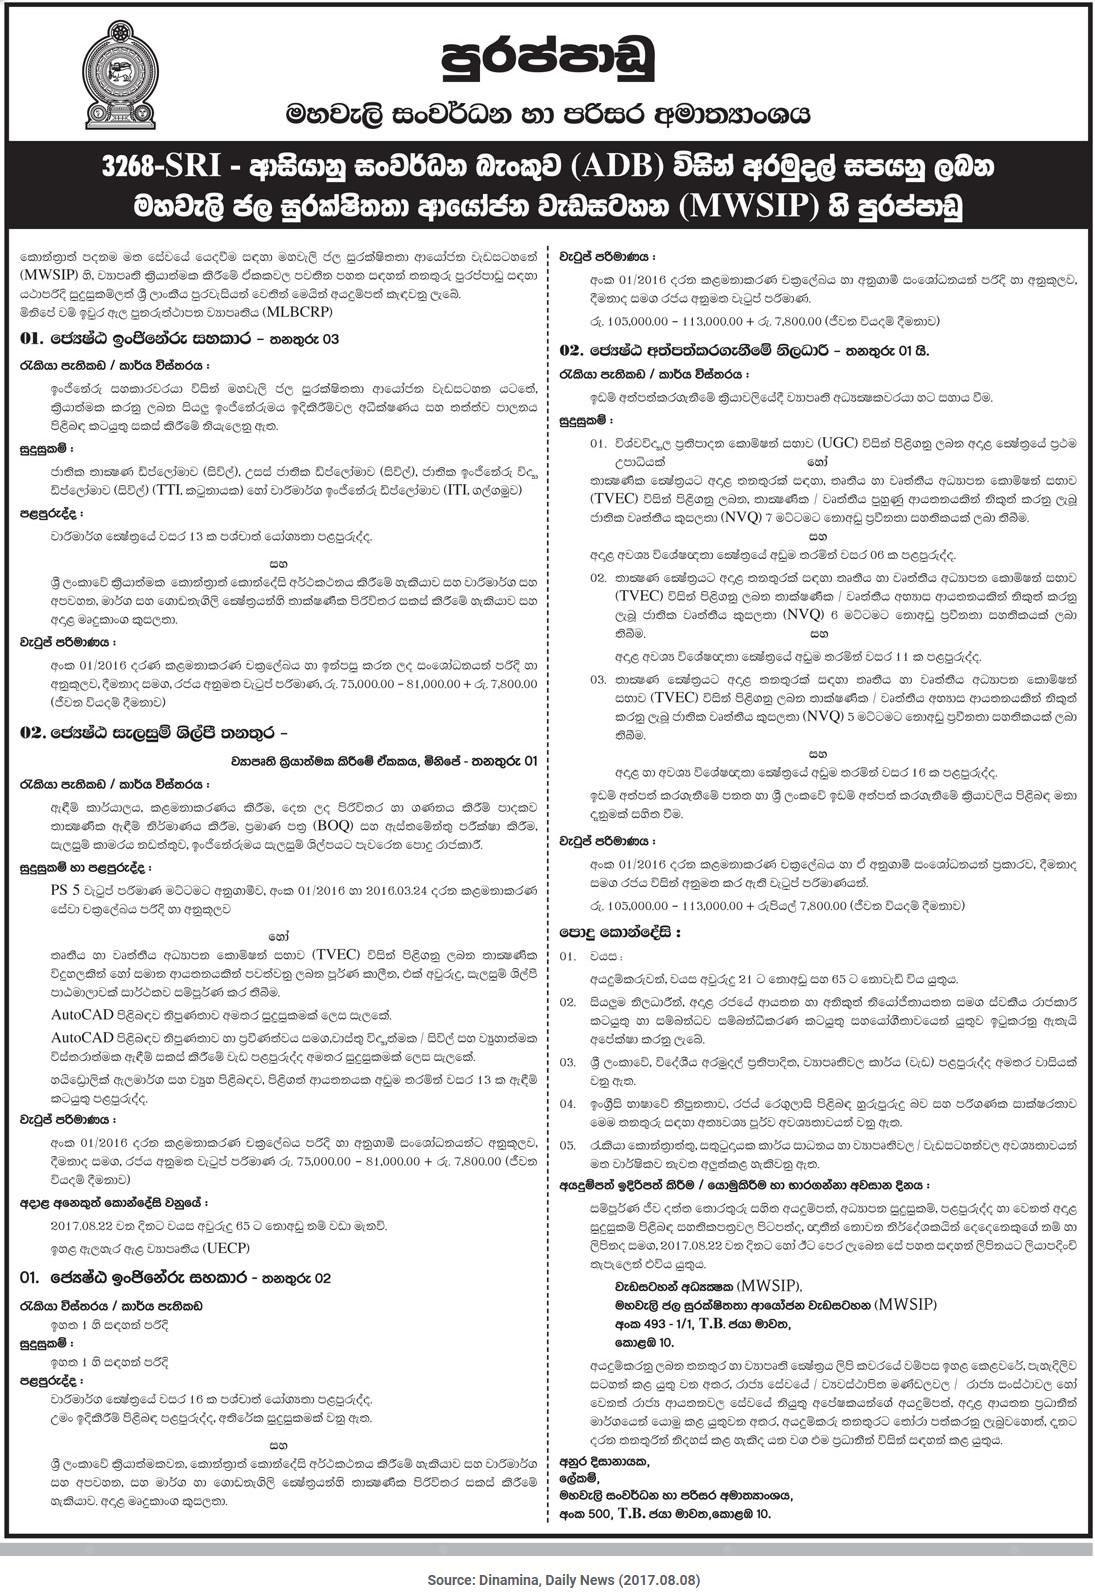 Vacancies at Ministry of Mahaweli Development